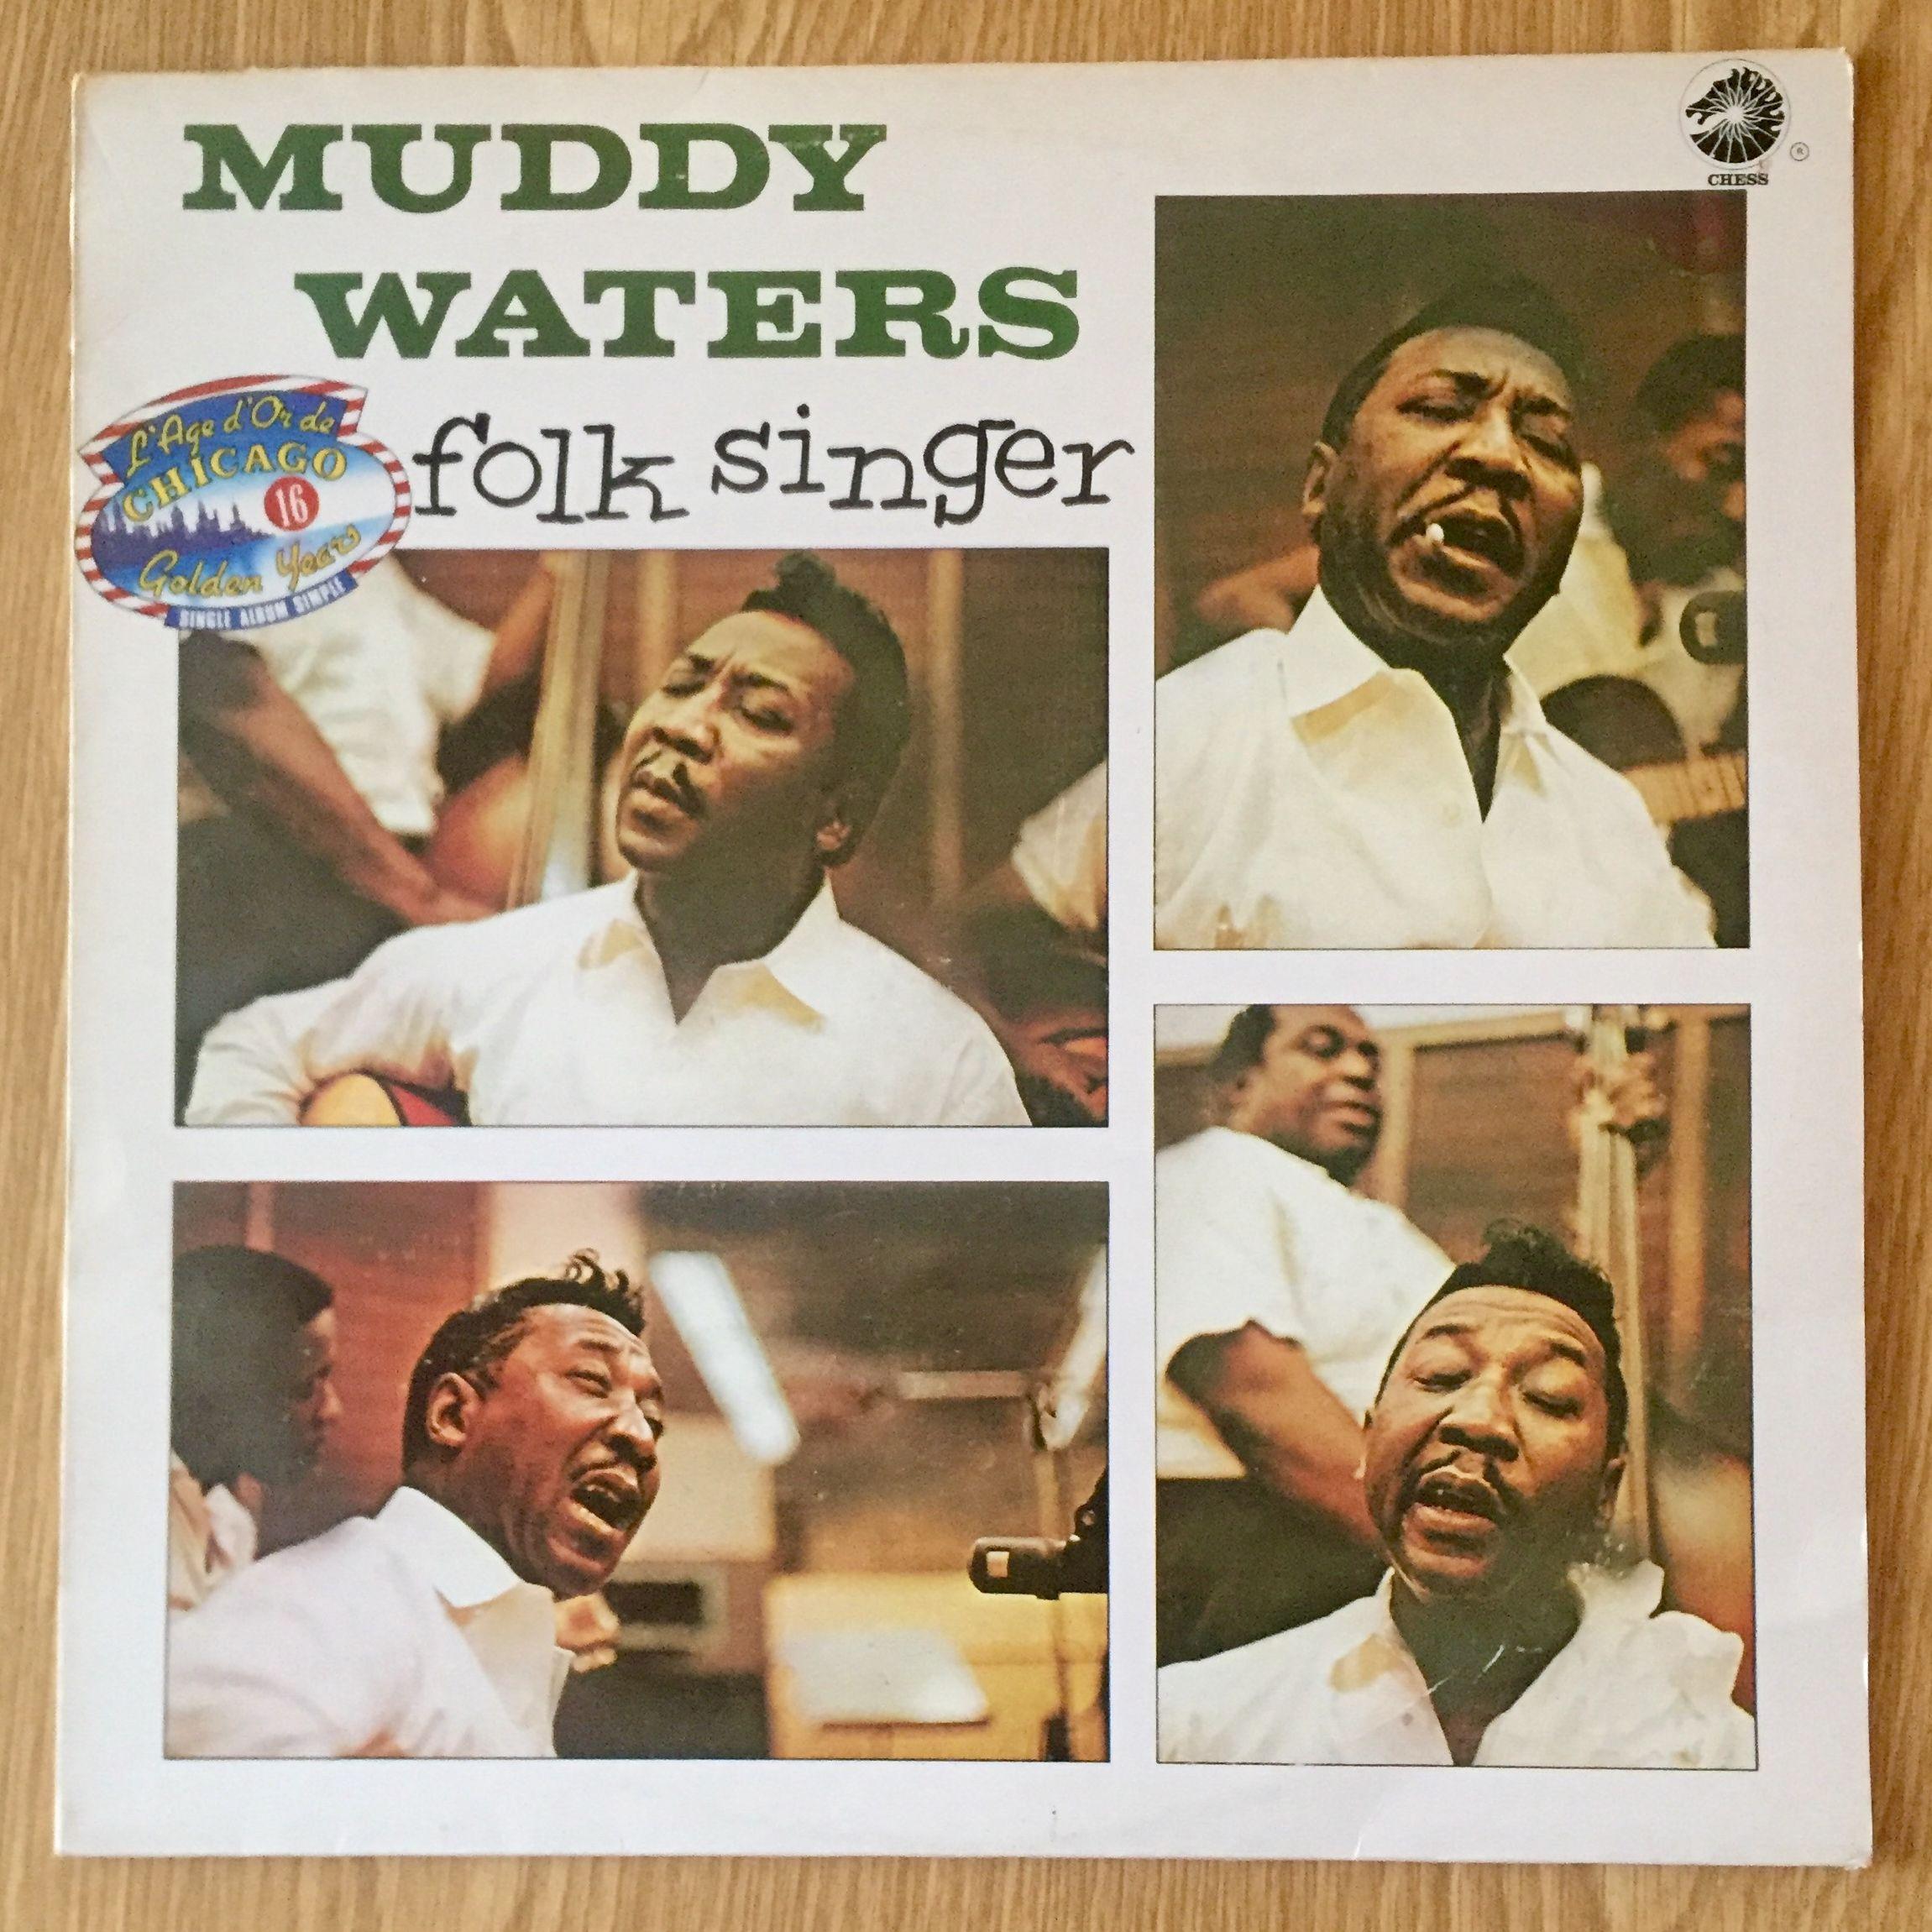 Muddy Waters Folk Singer LP undefined